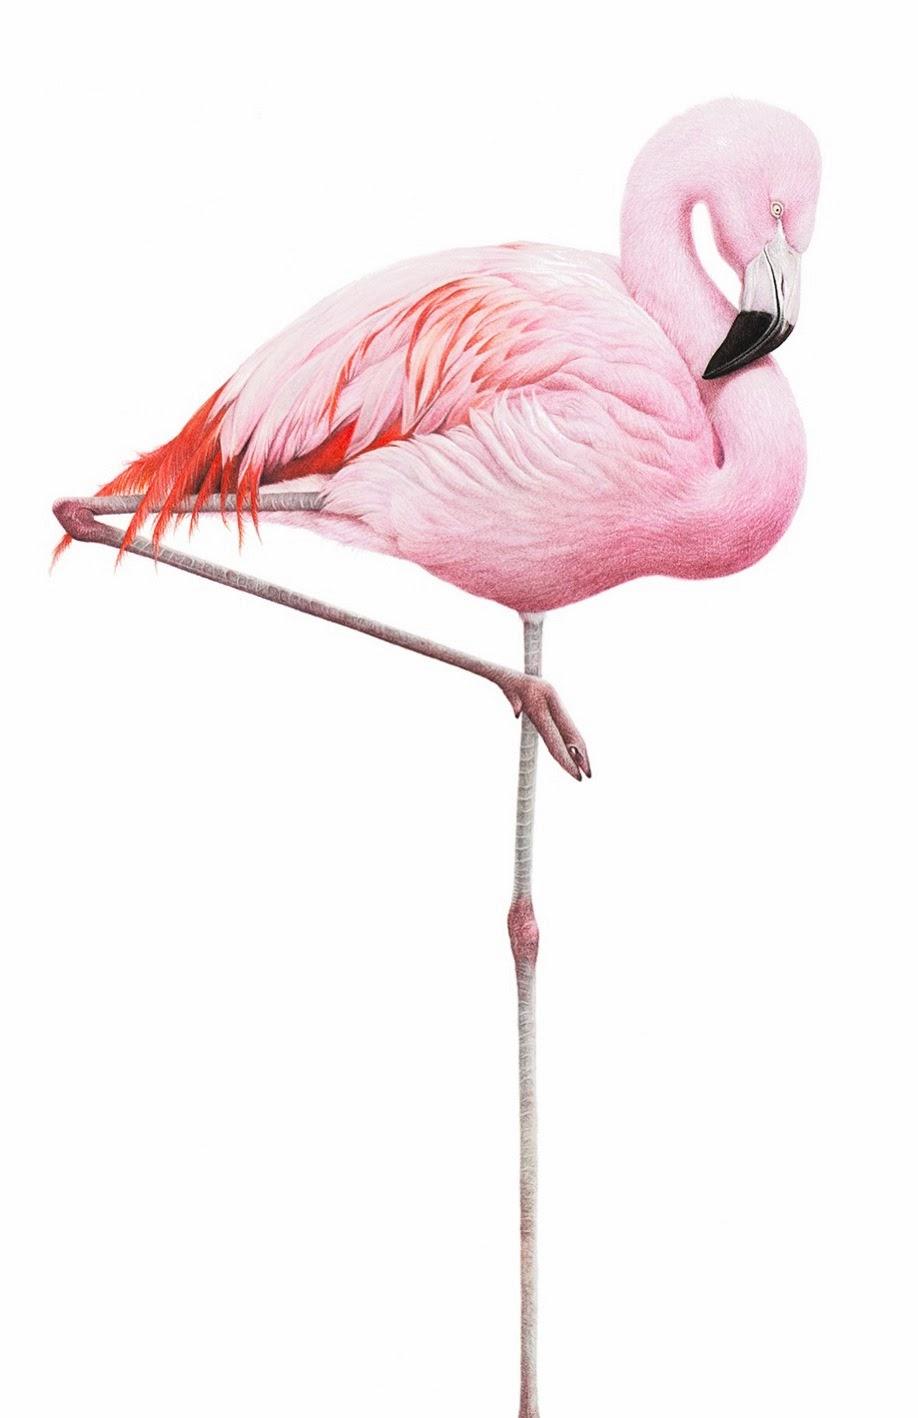 Martin Aveling Art: New Limited Edidtion Flamingo Print